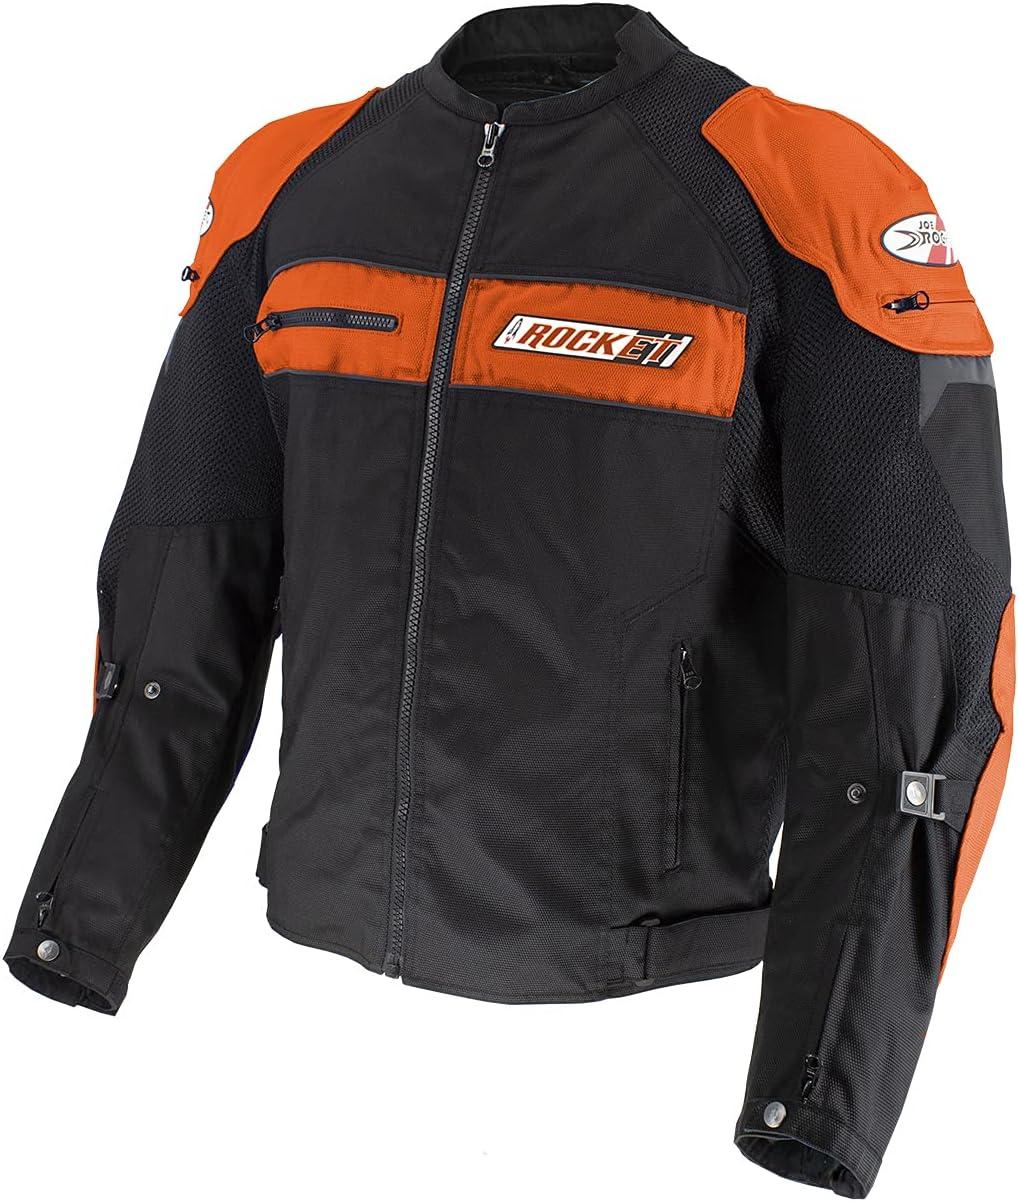 Joe Rocket Men's San Jose Mall Dayride Orange 3X Black Super Special SALE held Jacket